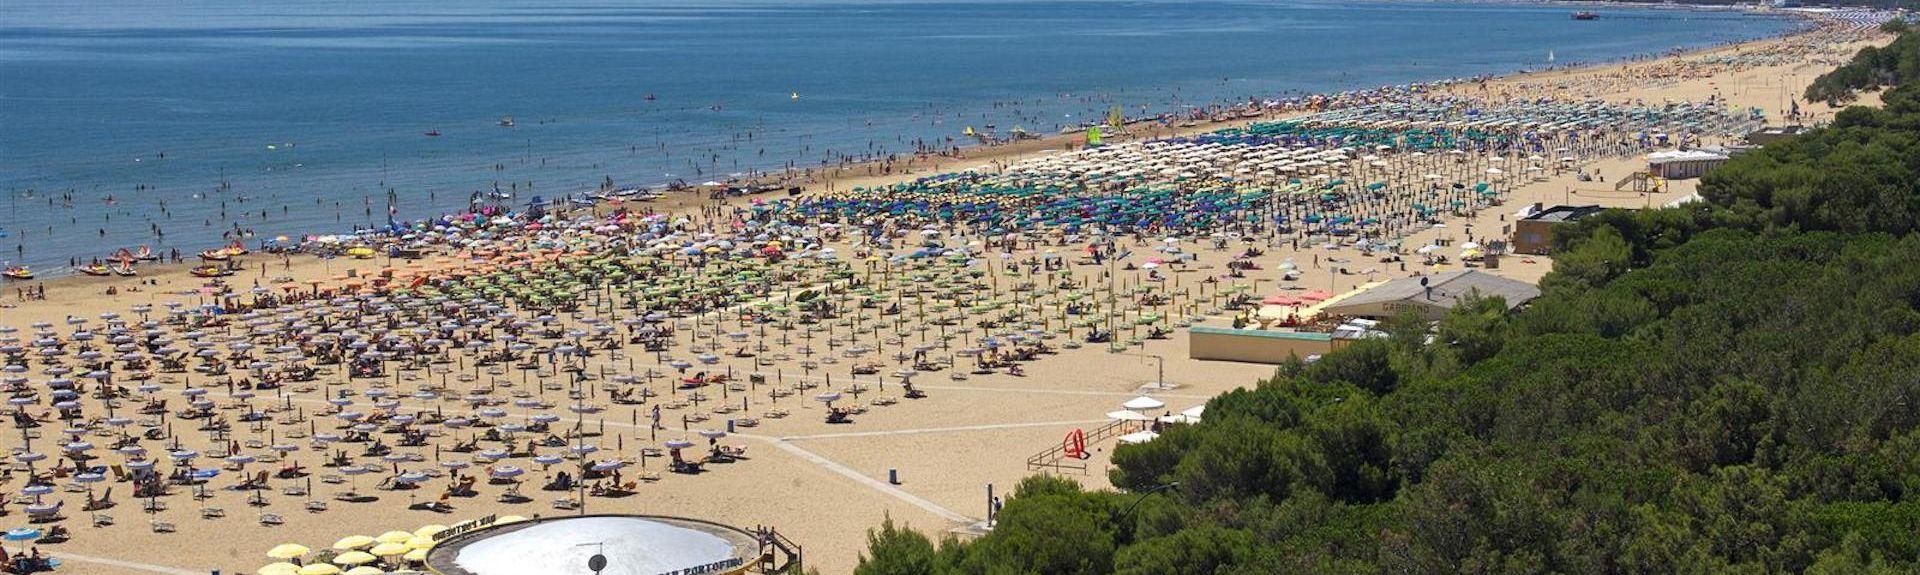 Province of Gorizia, Italy